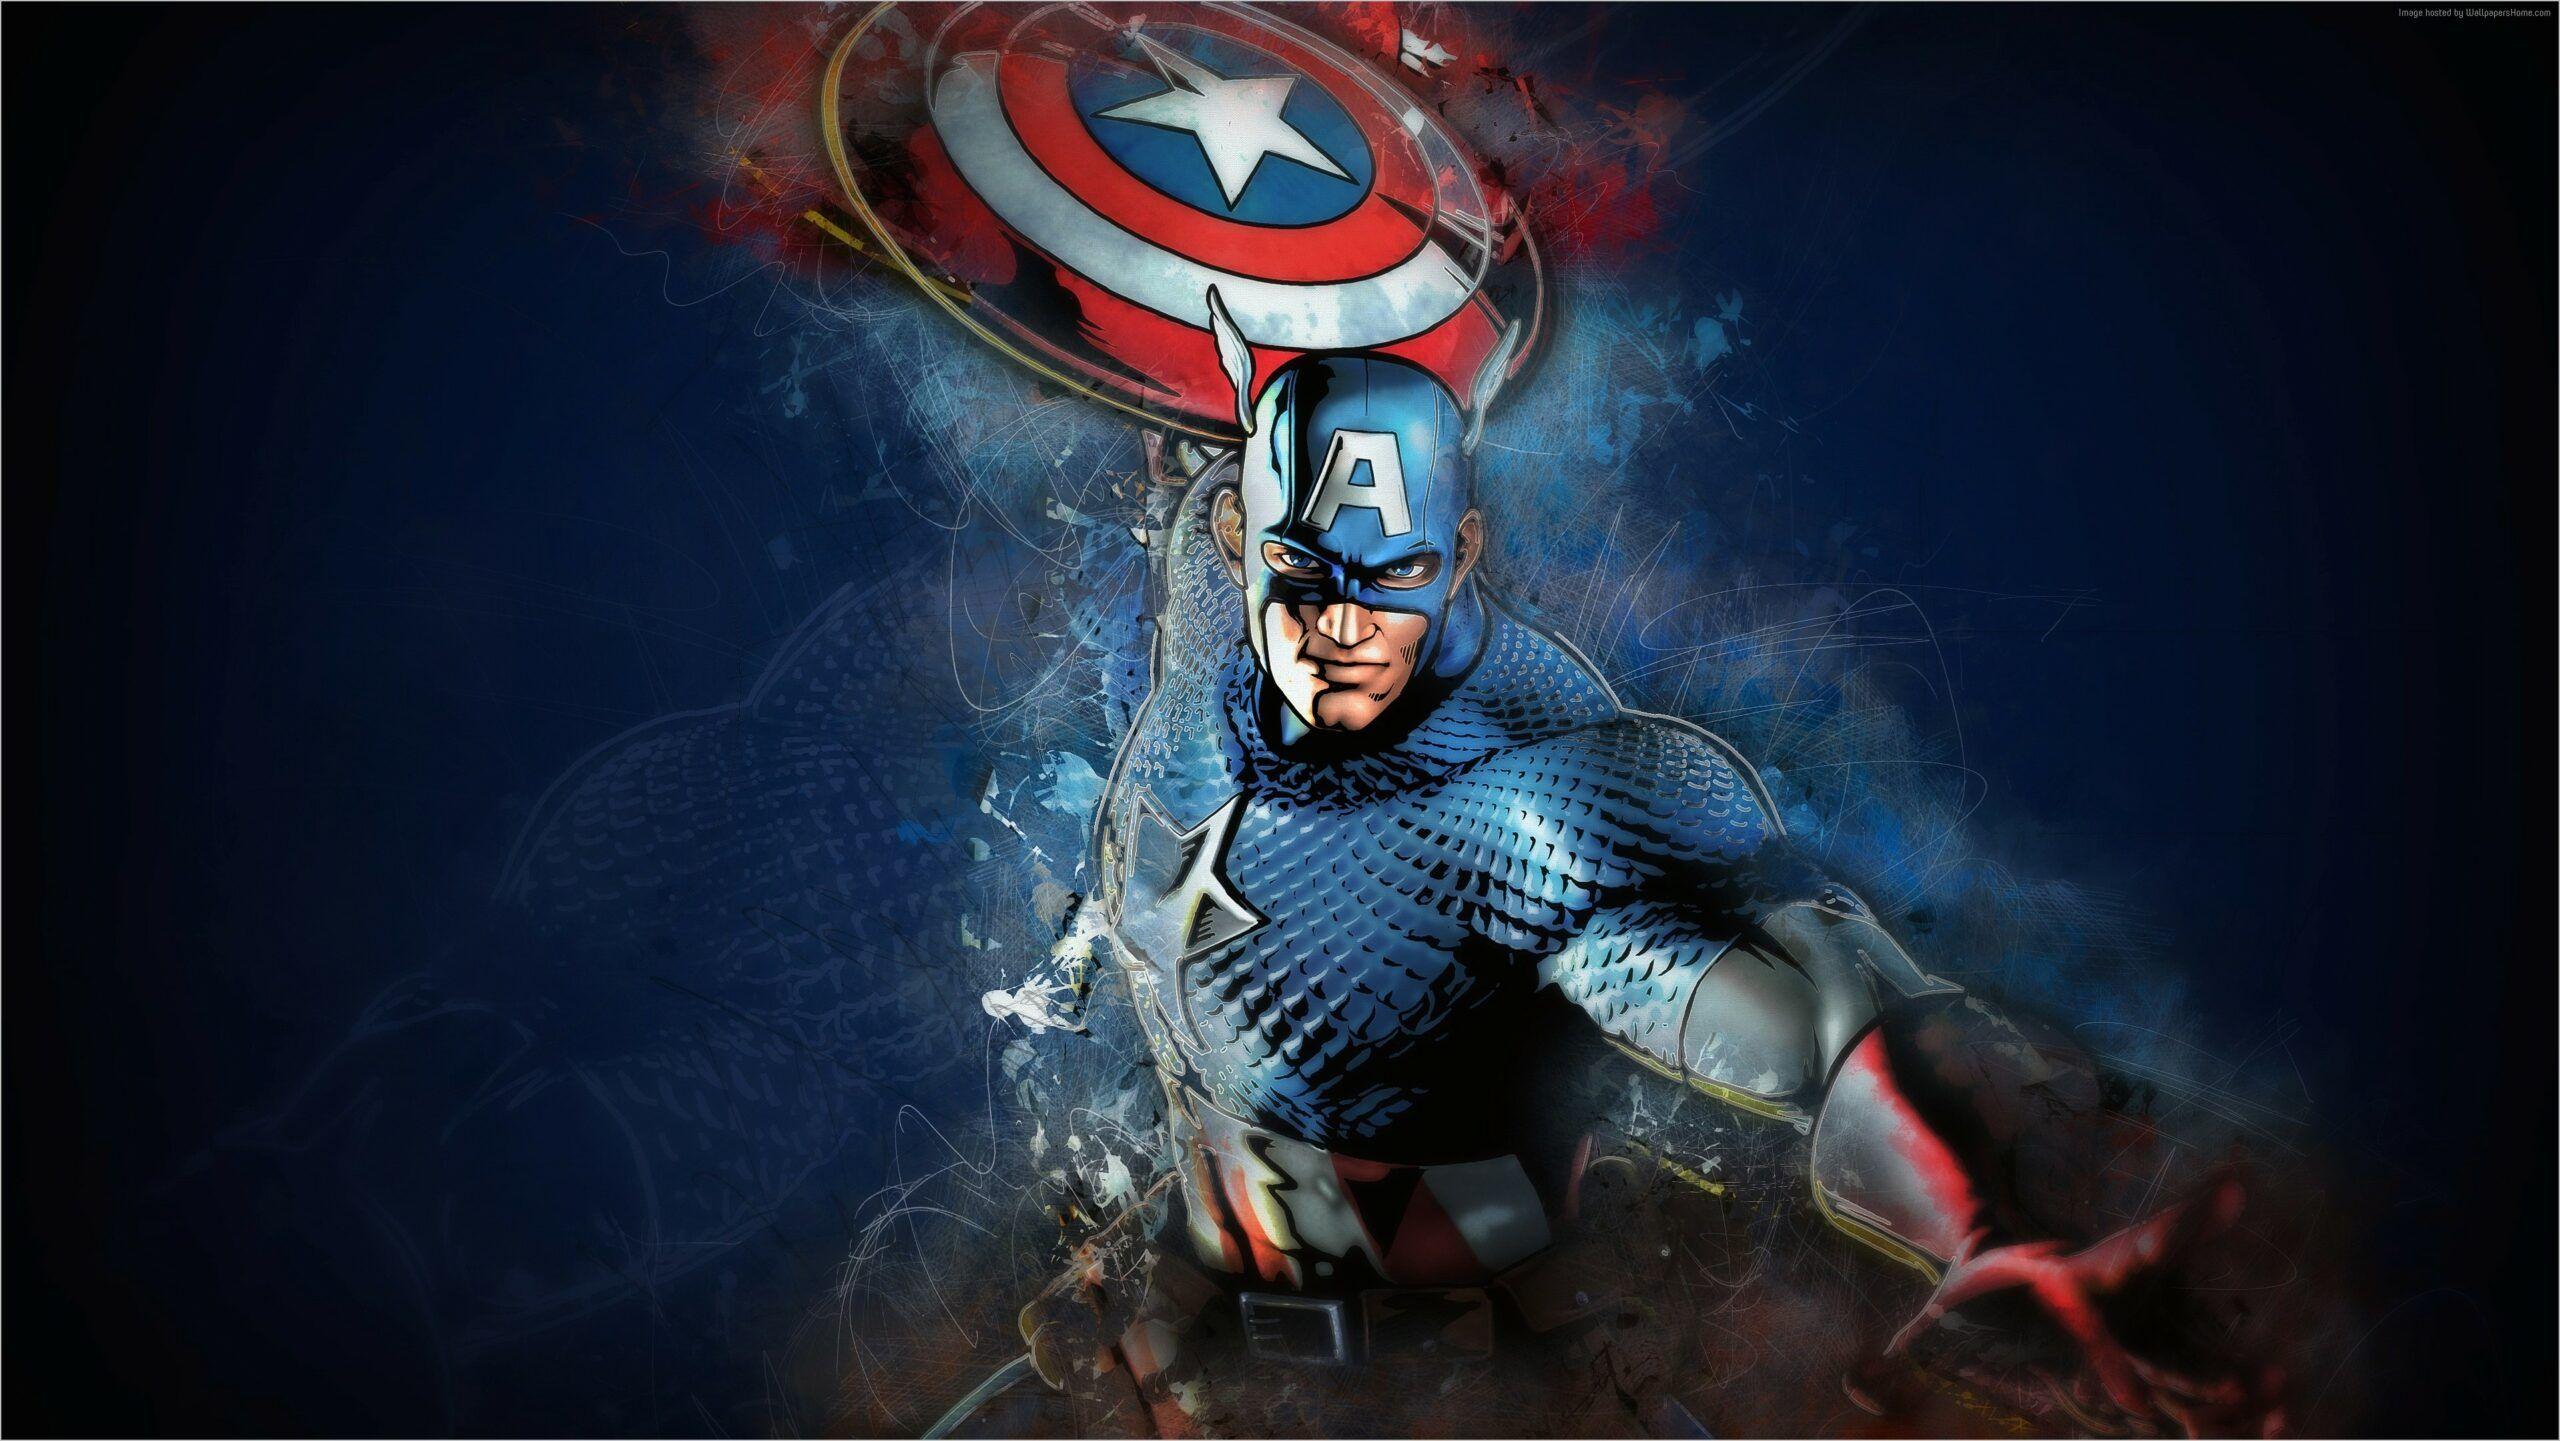 High Resolution Captain Marvel Wallpaper 4k In 2020 Marvel Wallpaper Hd Captain America Wallpaper Marvel Wallpaper